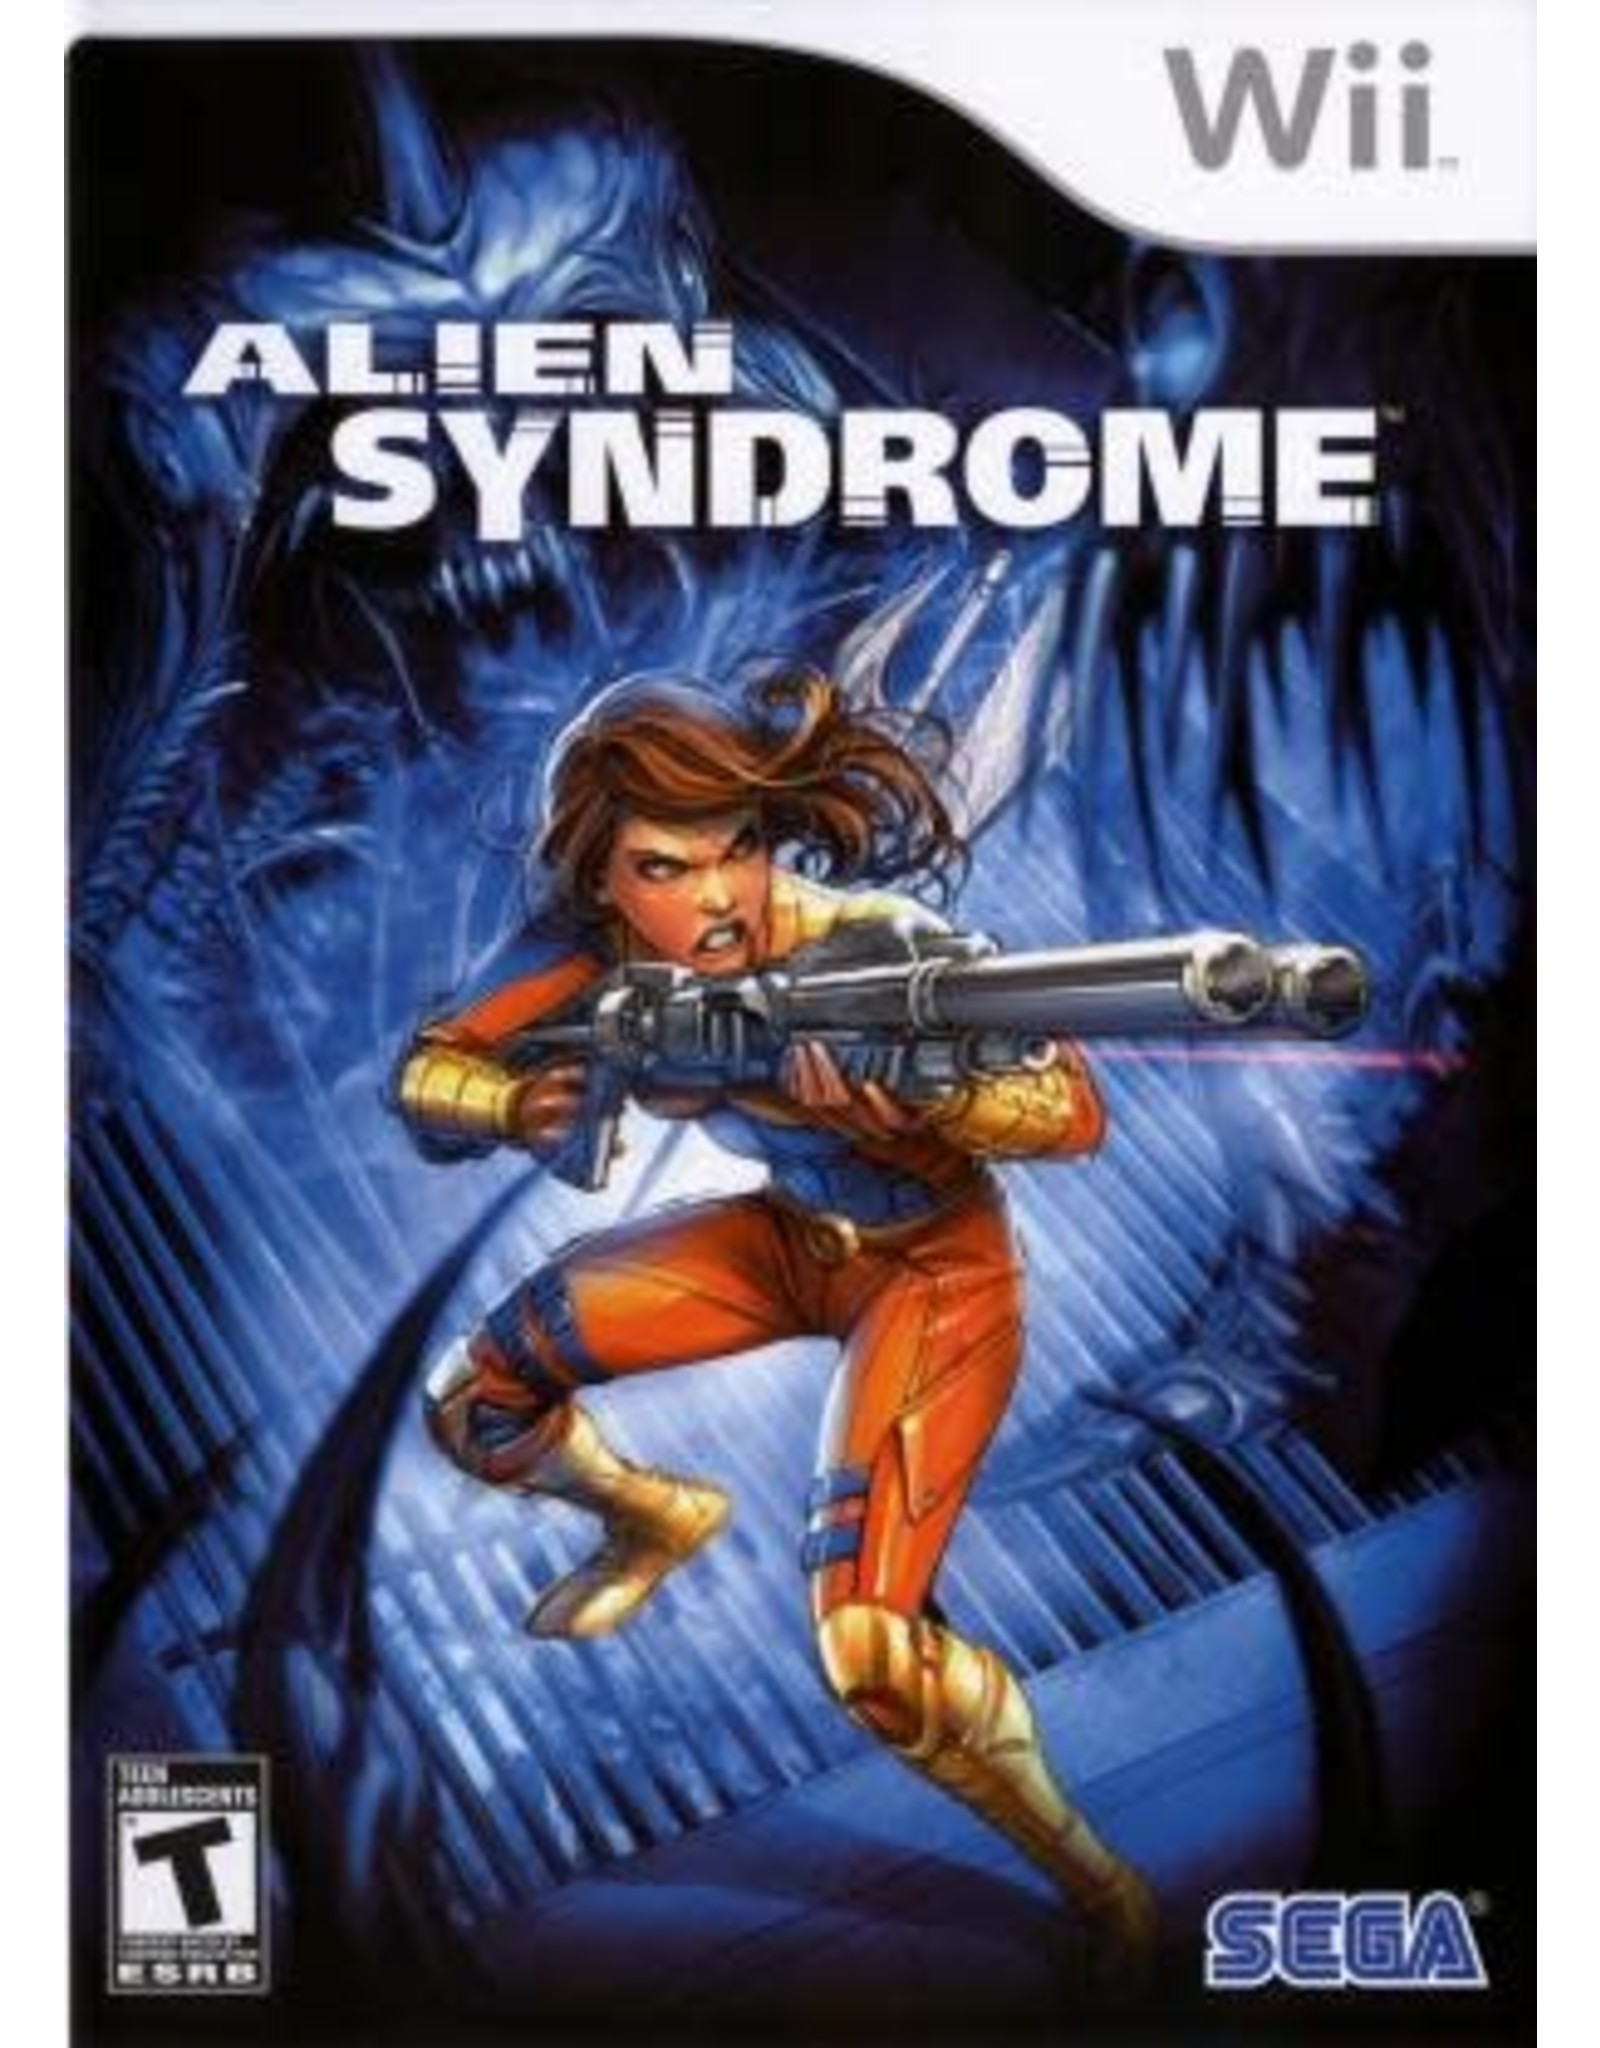 Wii Alien Syndrome (CIB)